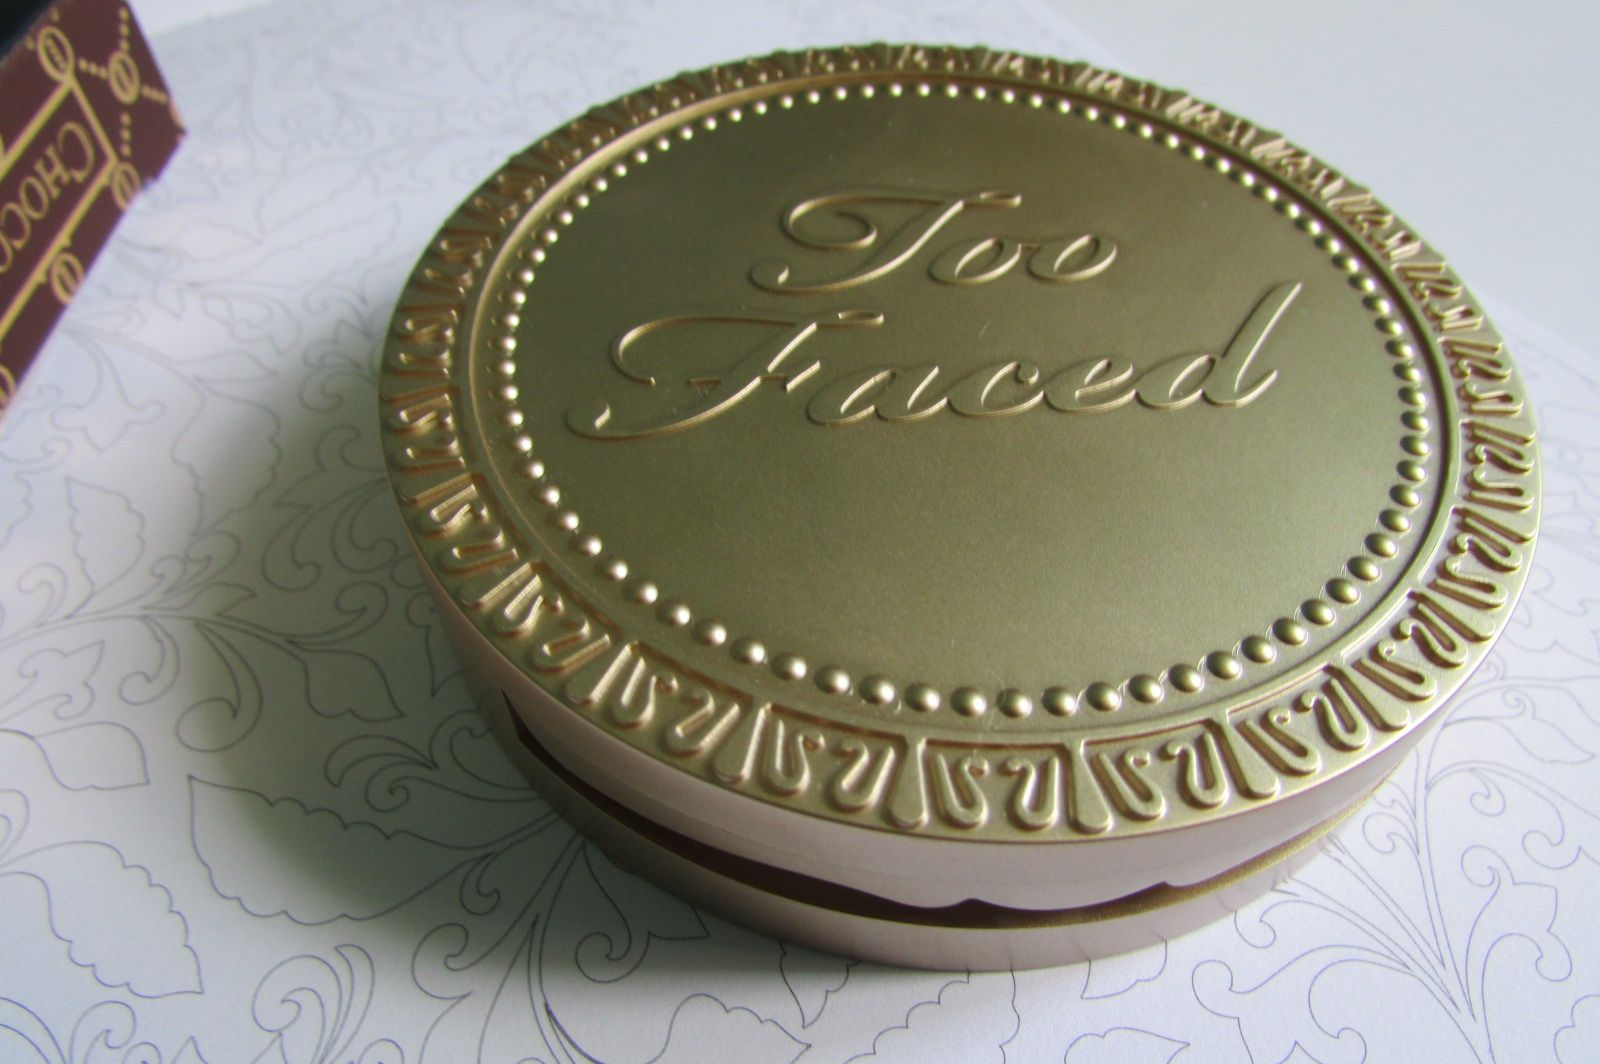 Le bronzer chocolate soleil de Too Faced